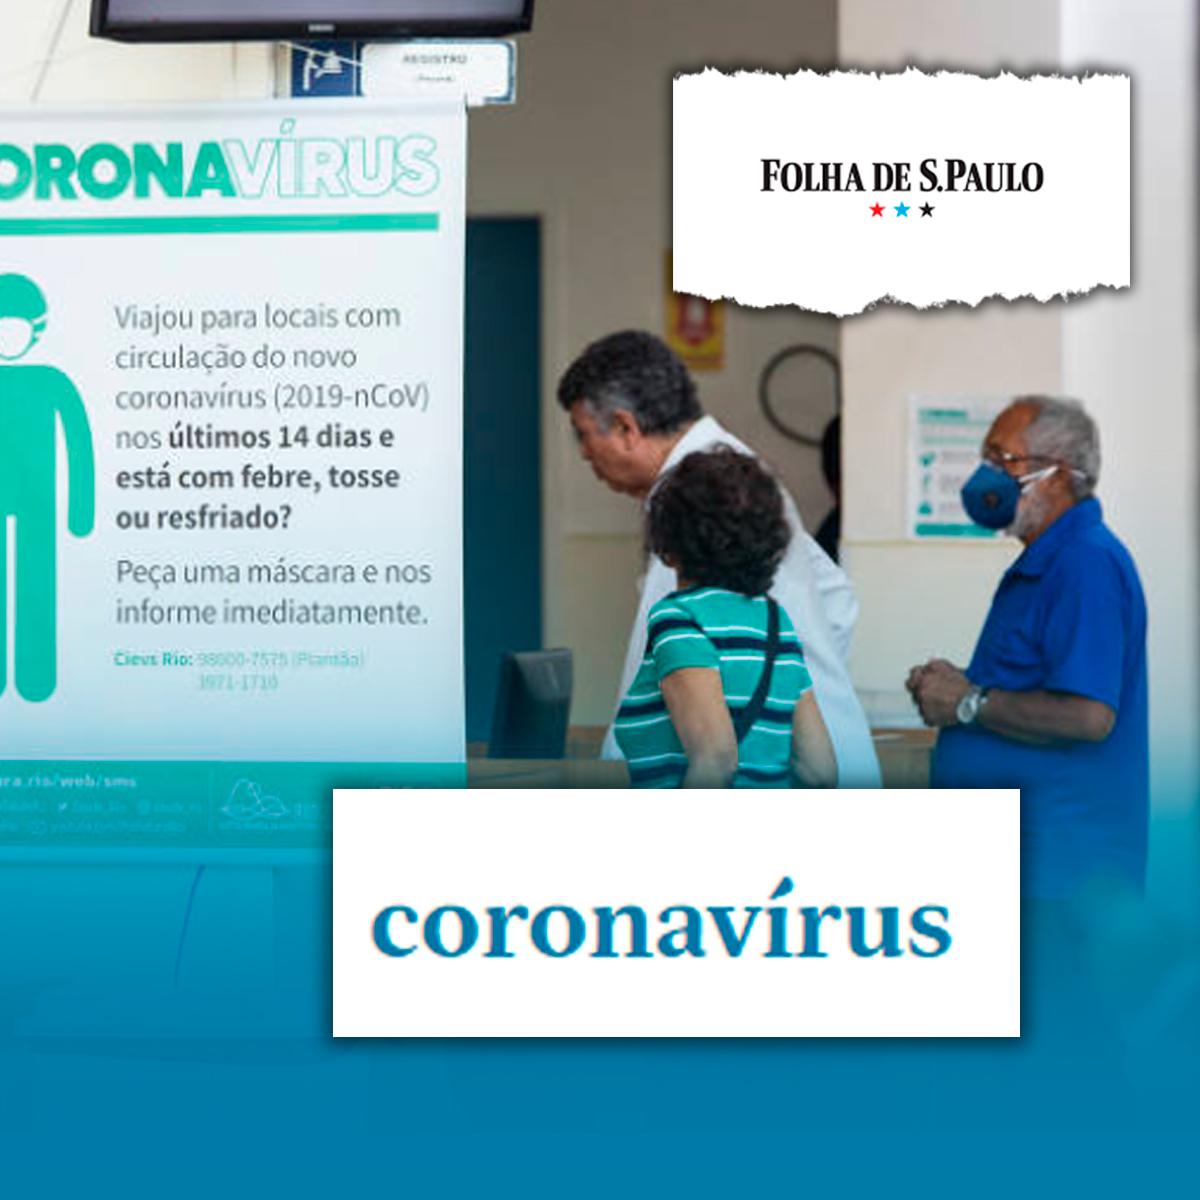 https://www1.folha.uol.com.br/cotidiano/coronavirus/